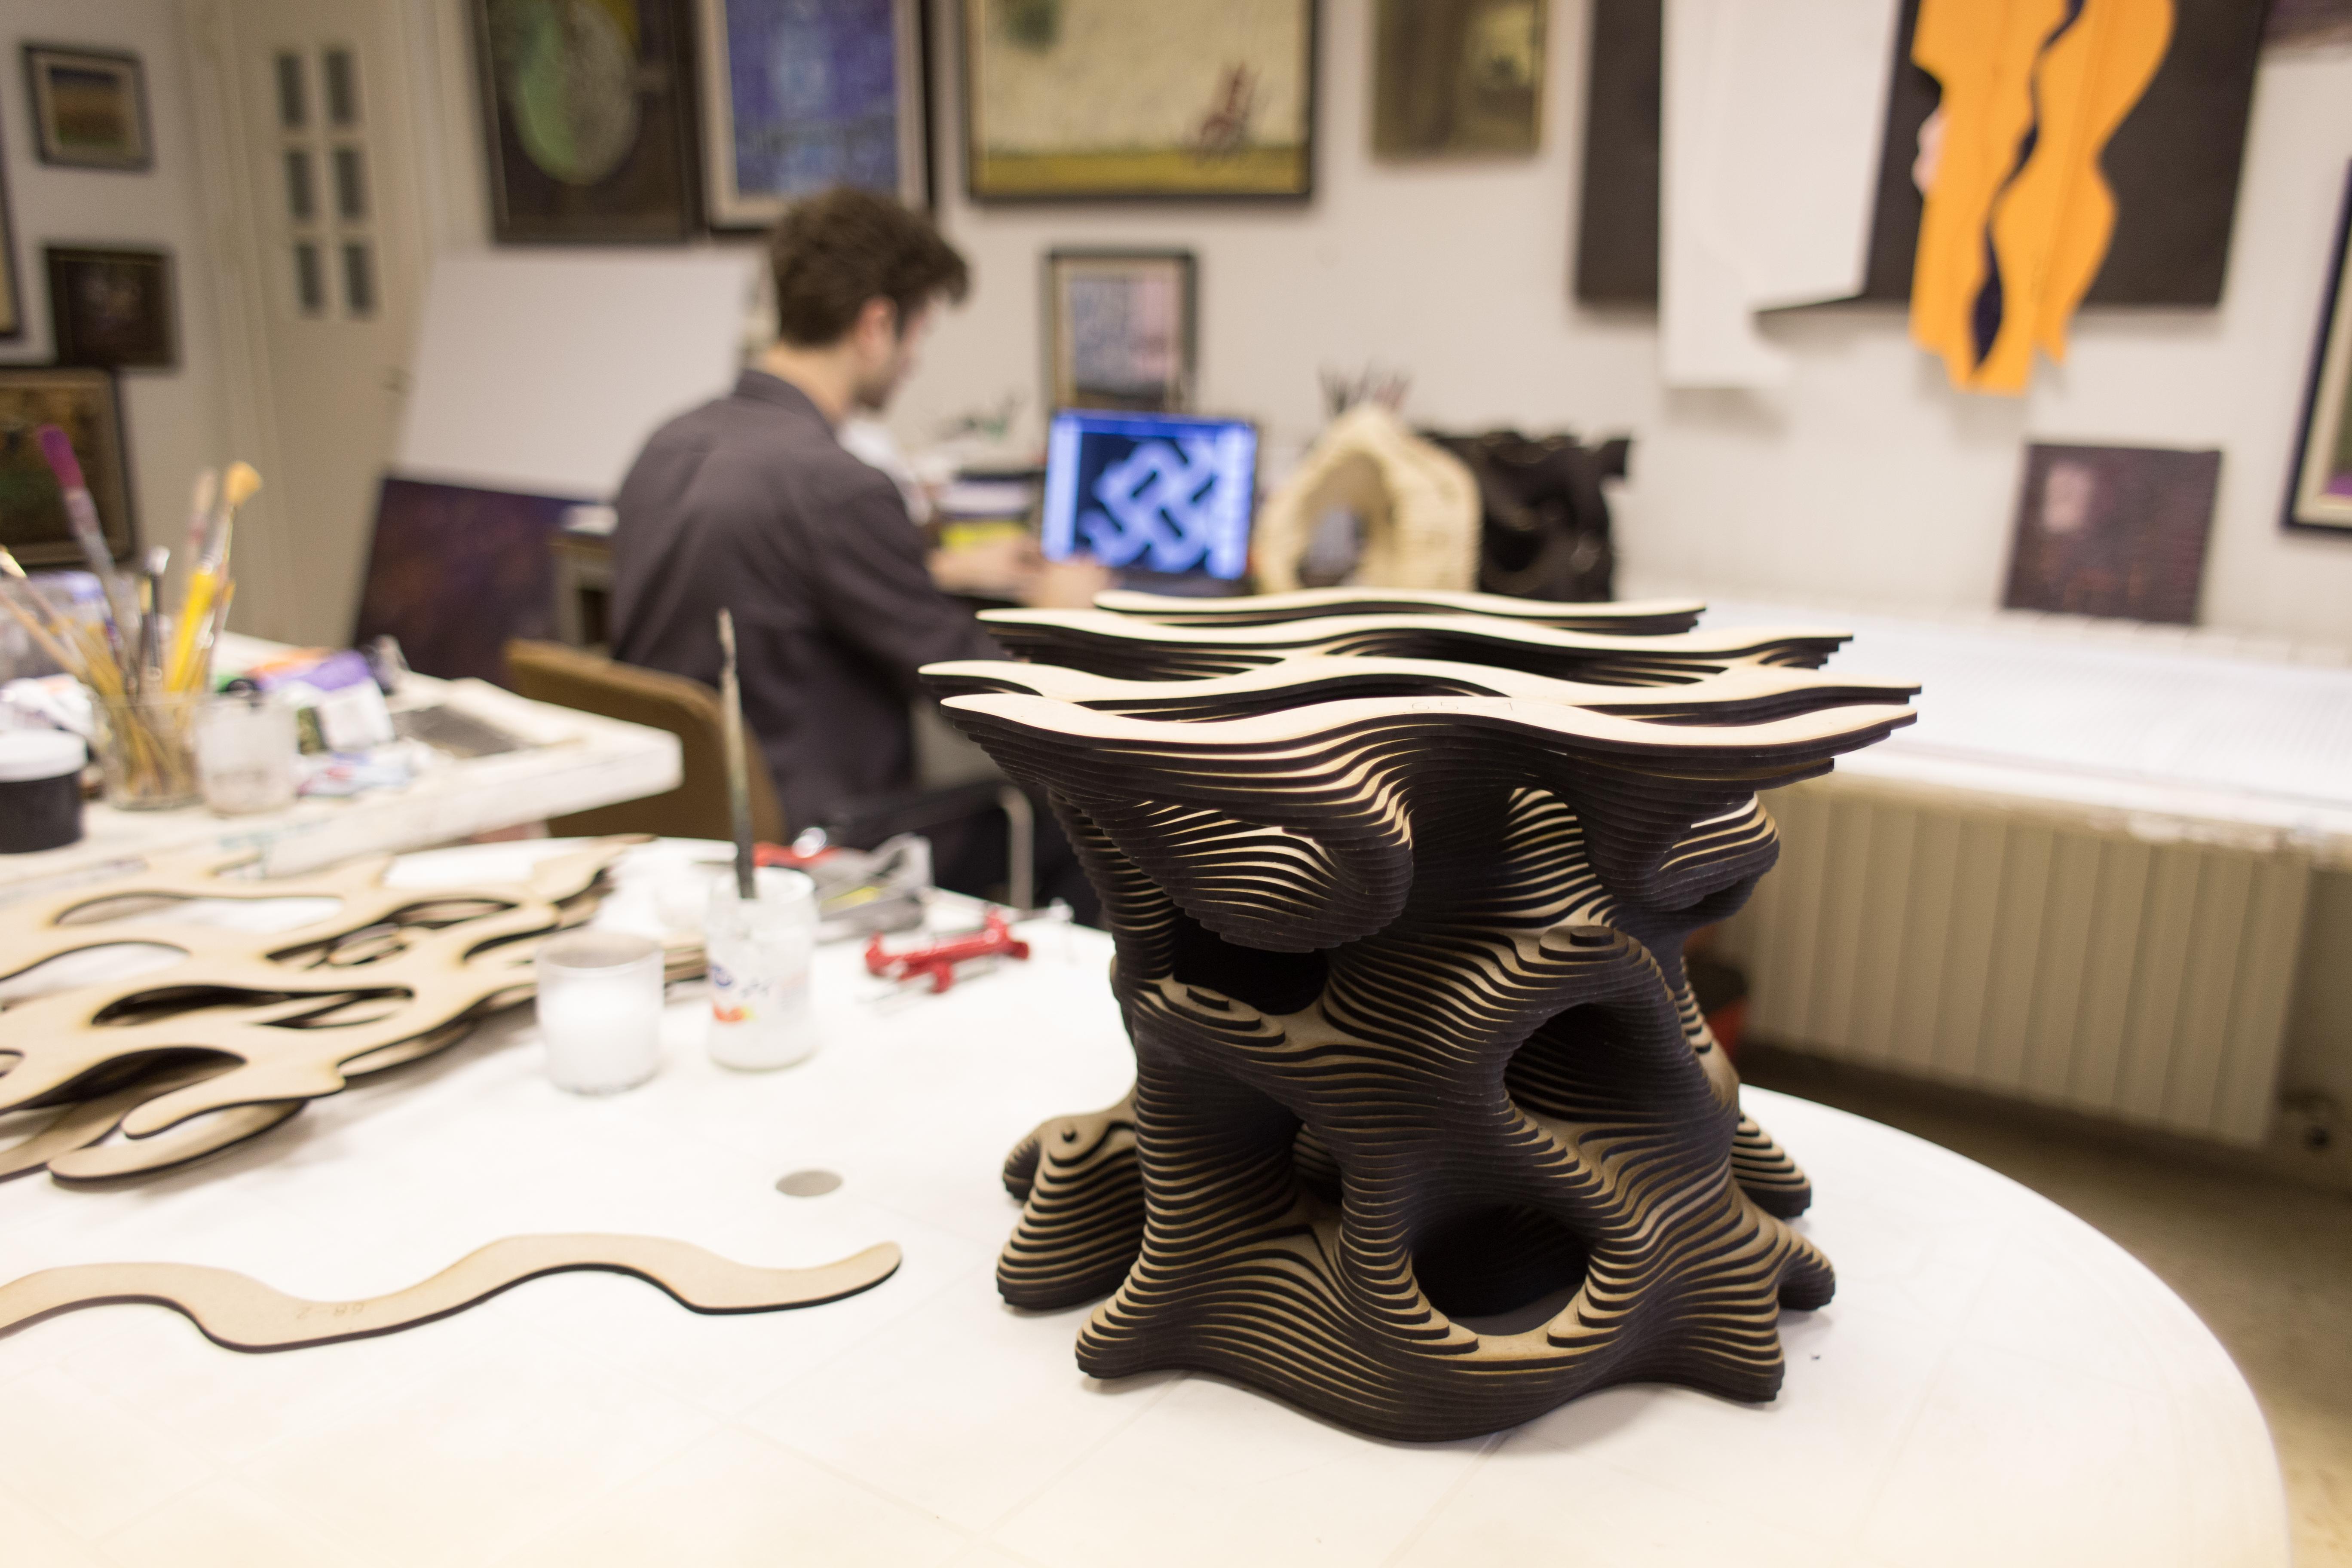 A glimpse into the studio of designer Hashem Joucka